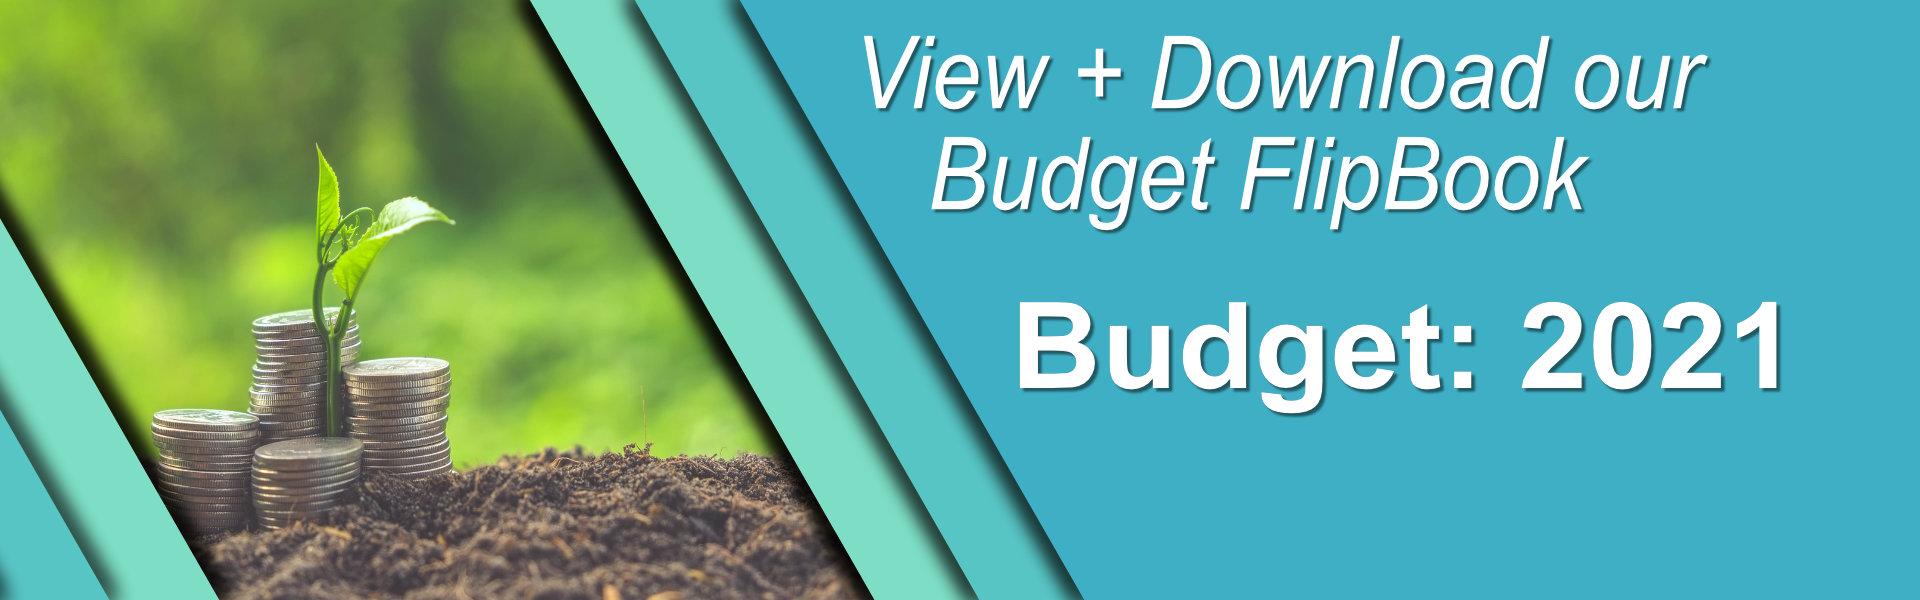 DR_Budget2021